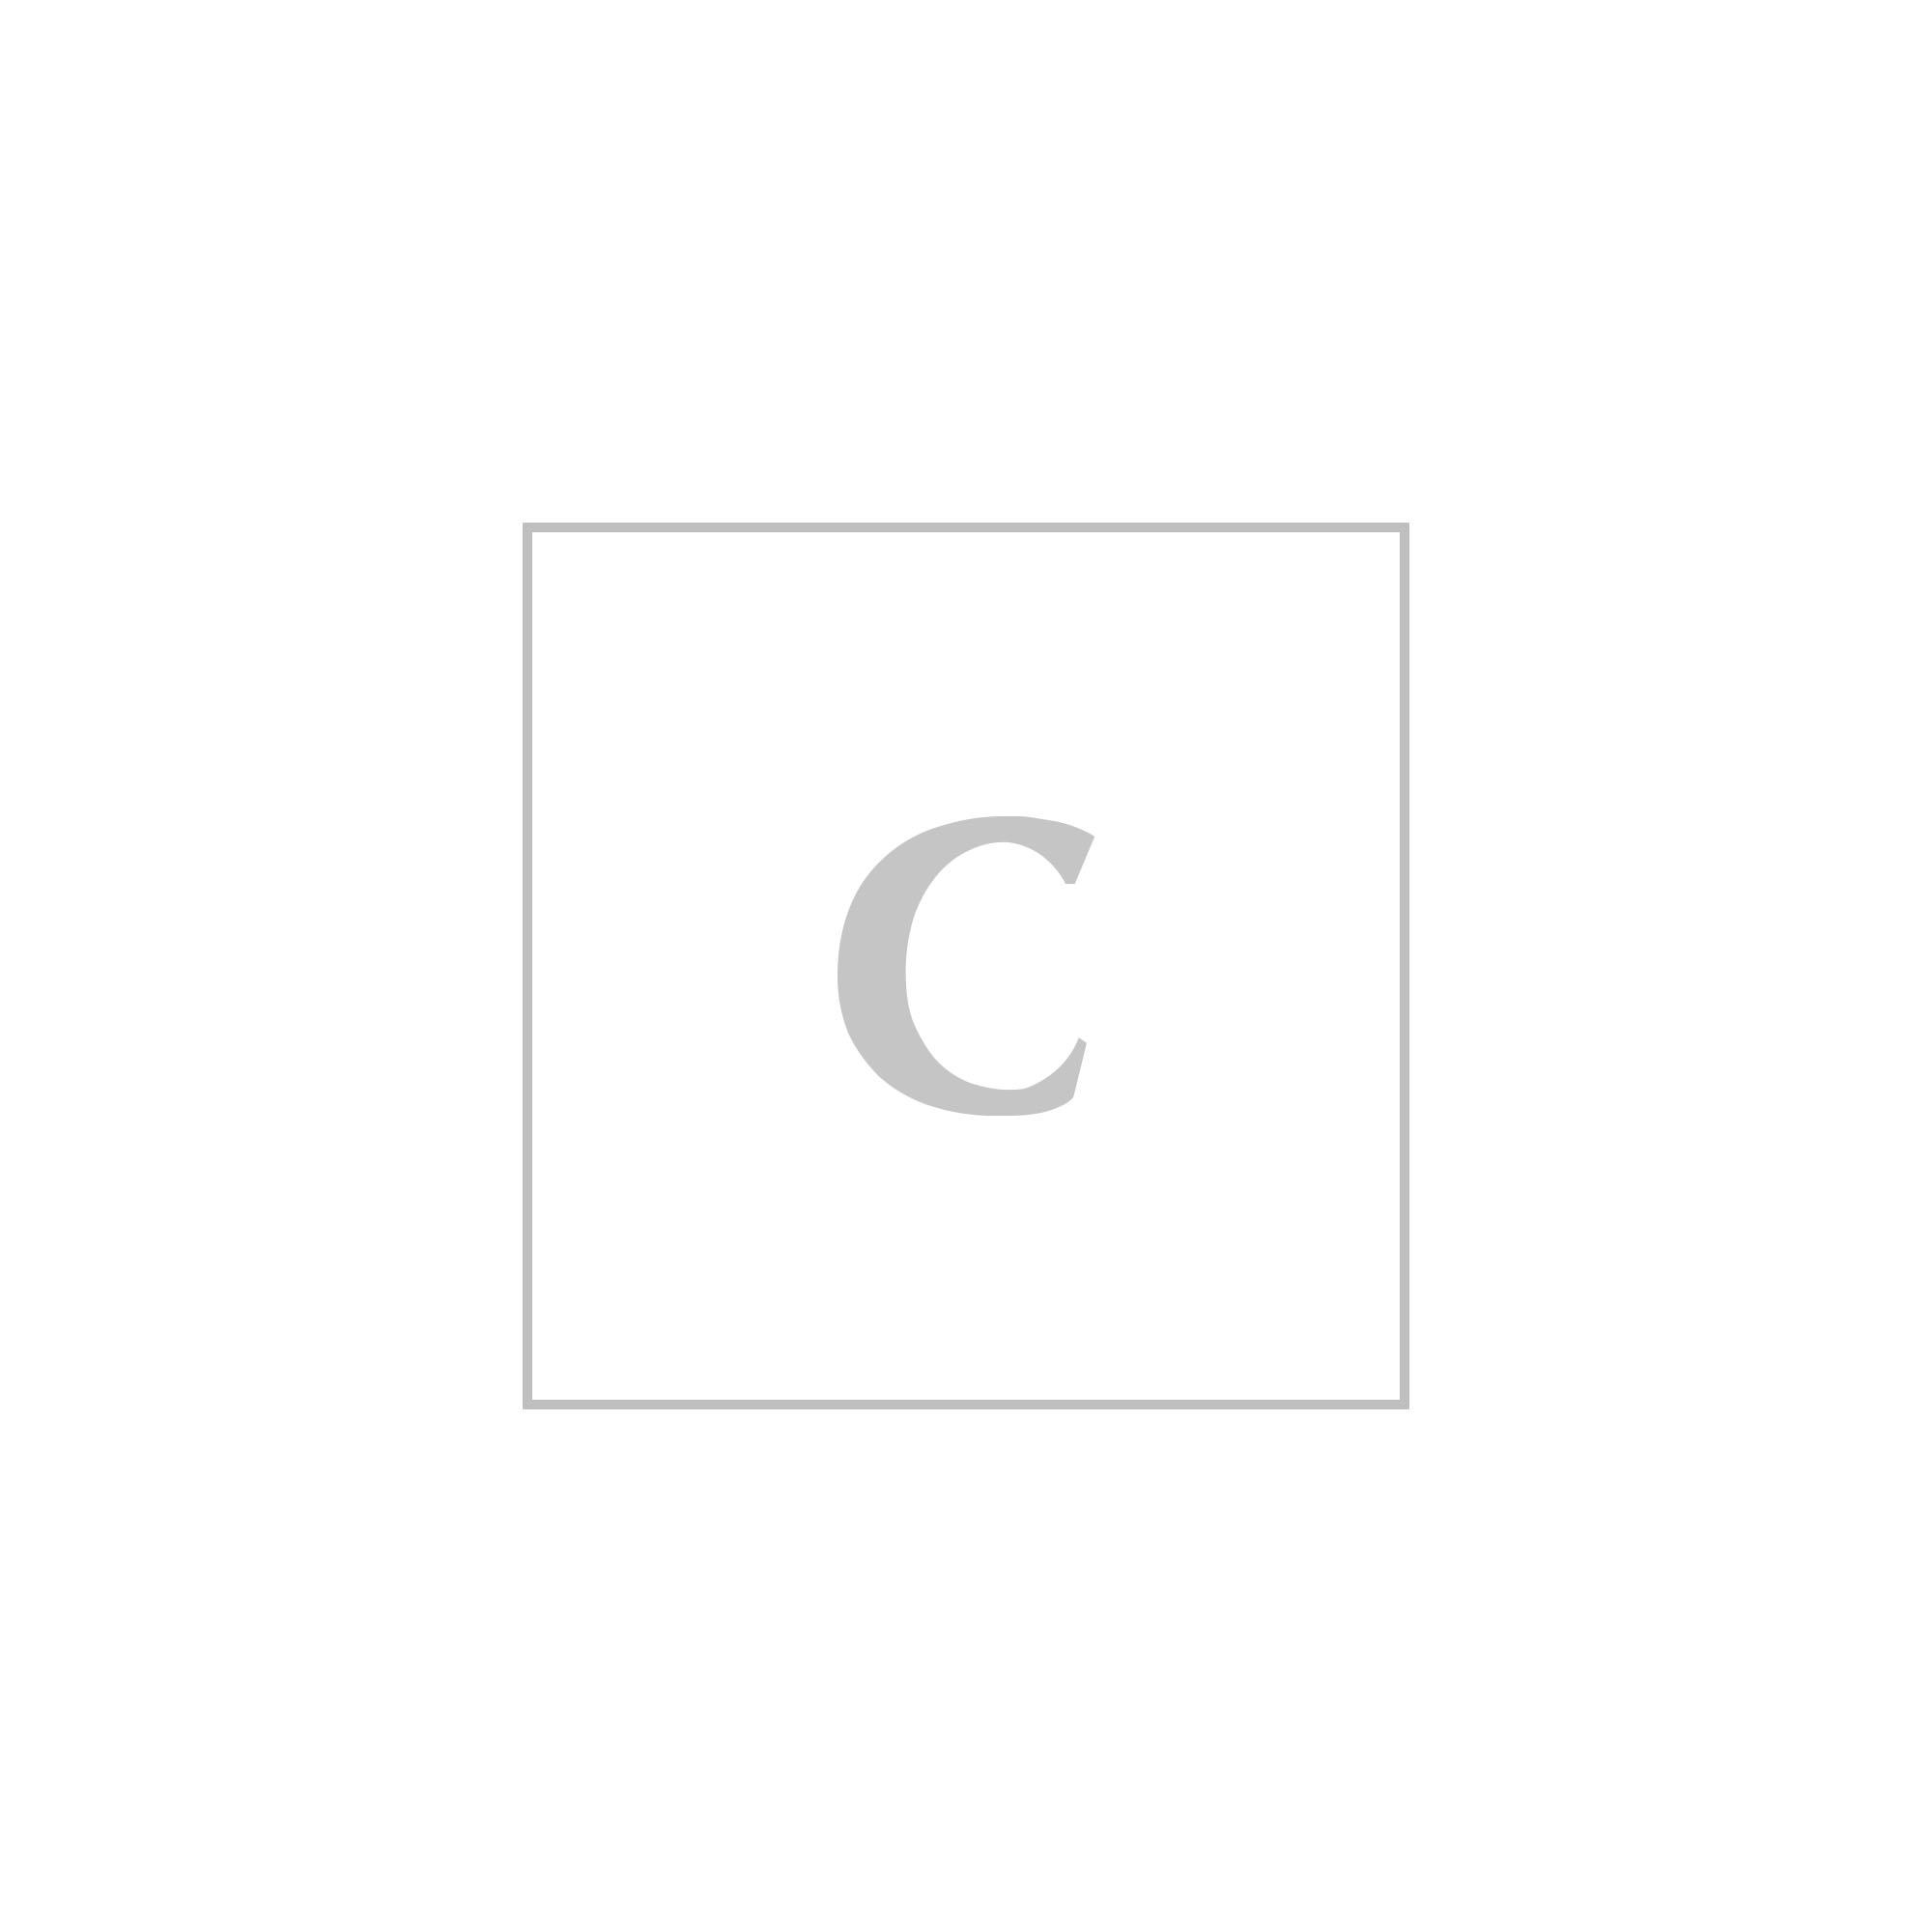 Moncler gamme rouge/bleu giaccone courtney